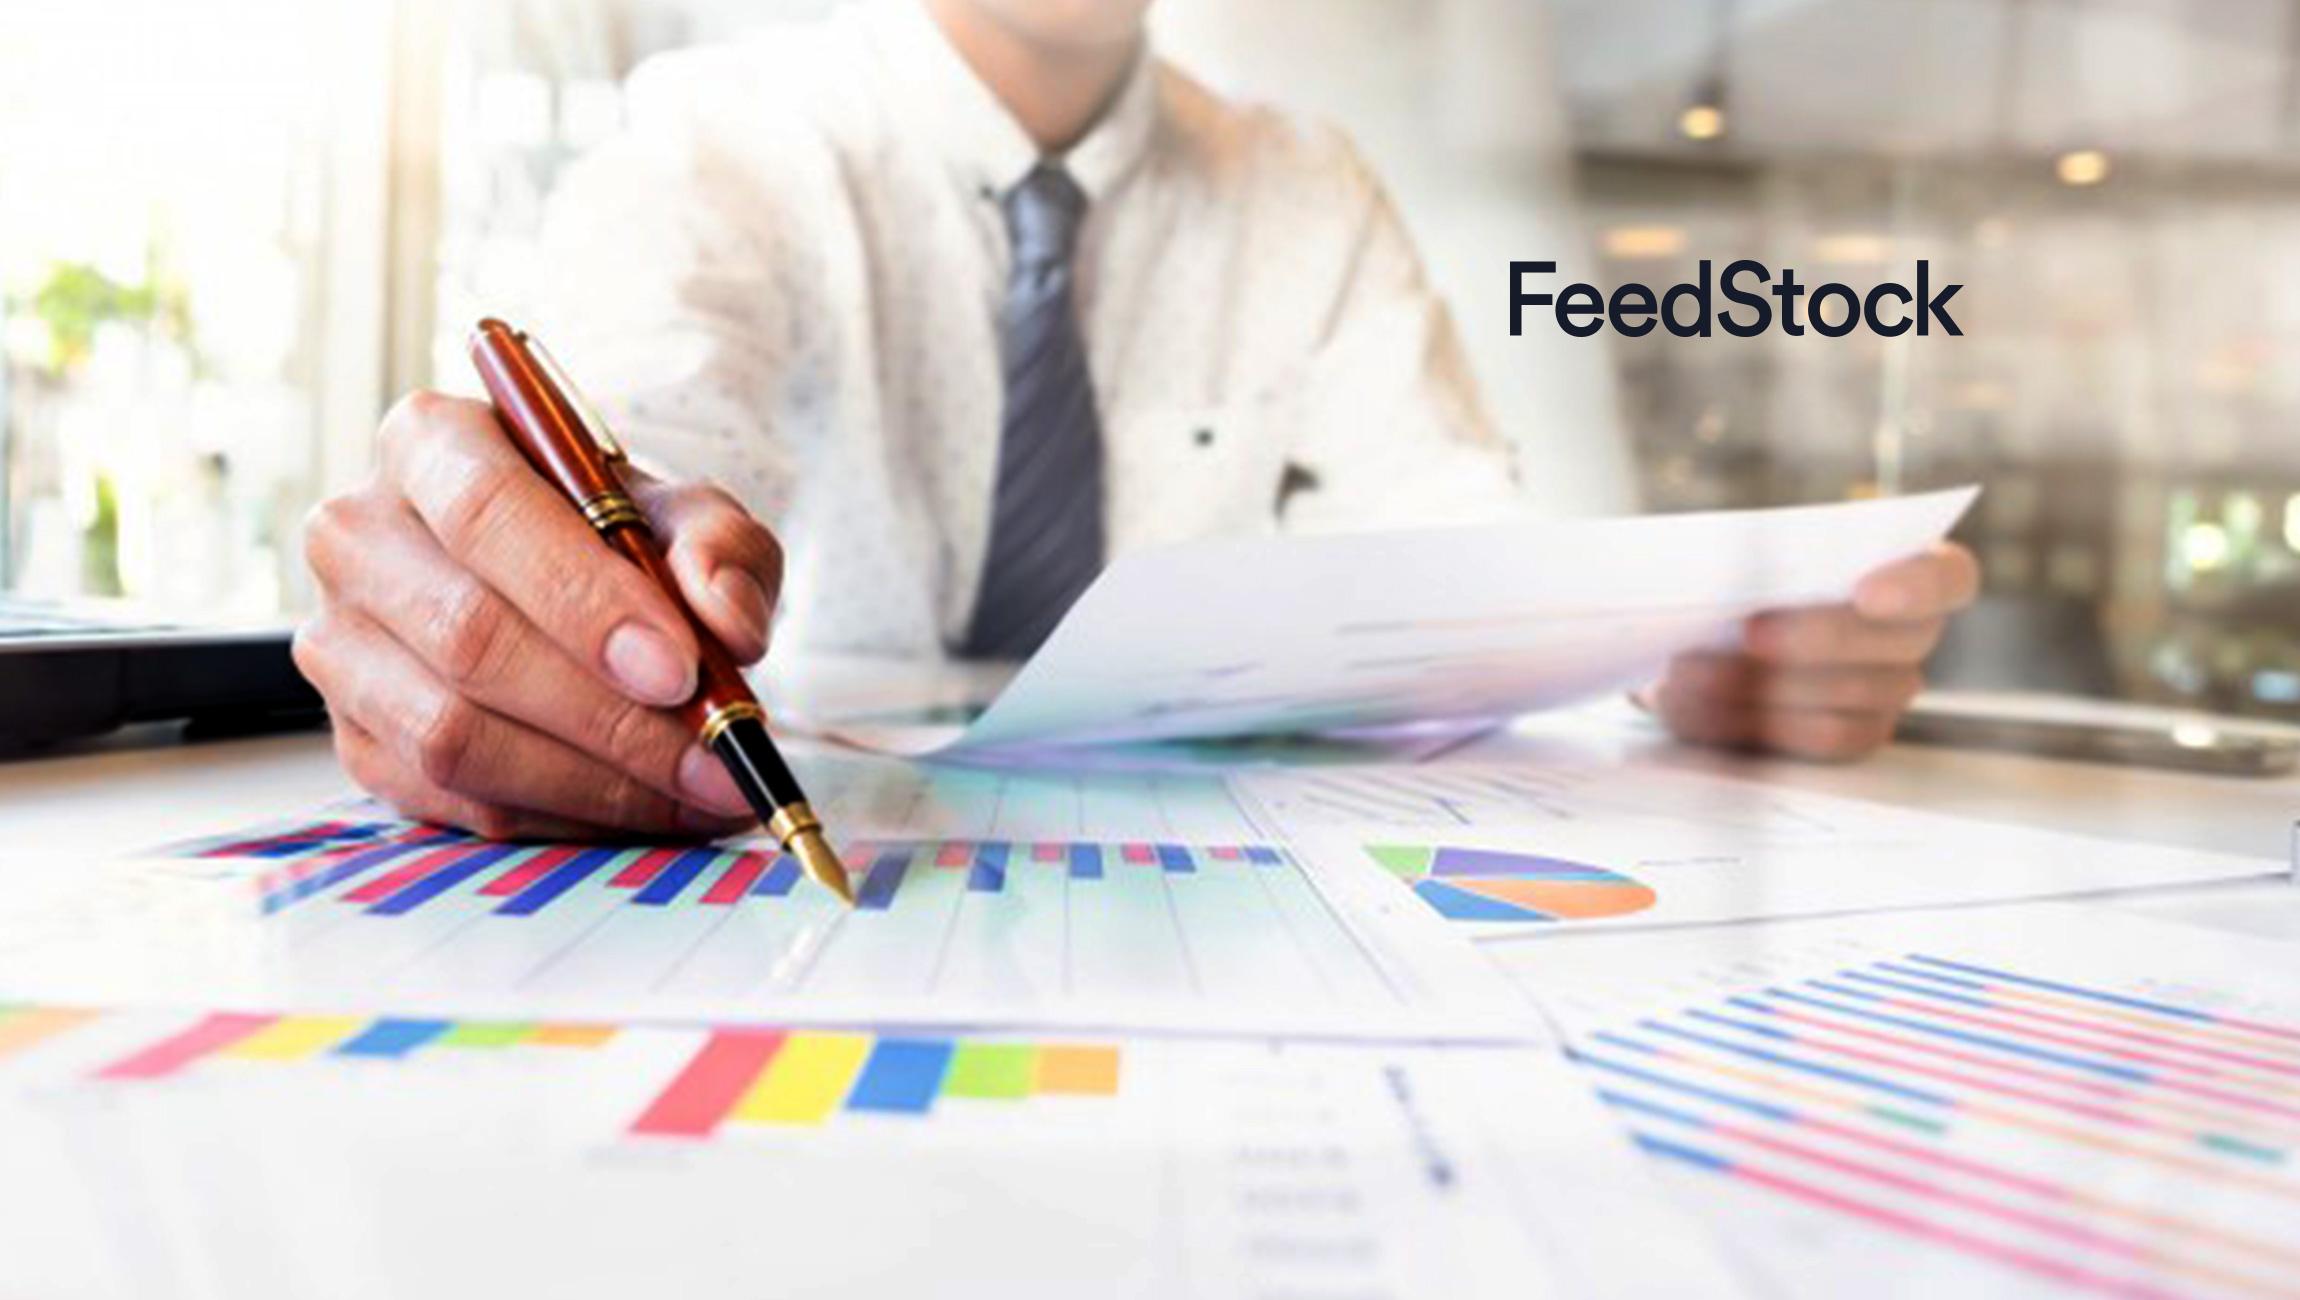 feedstock